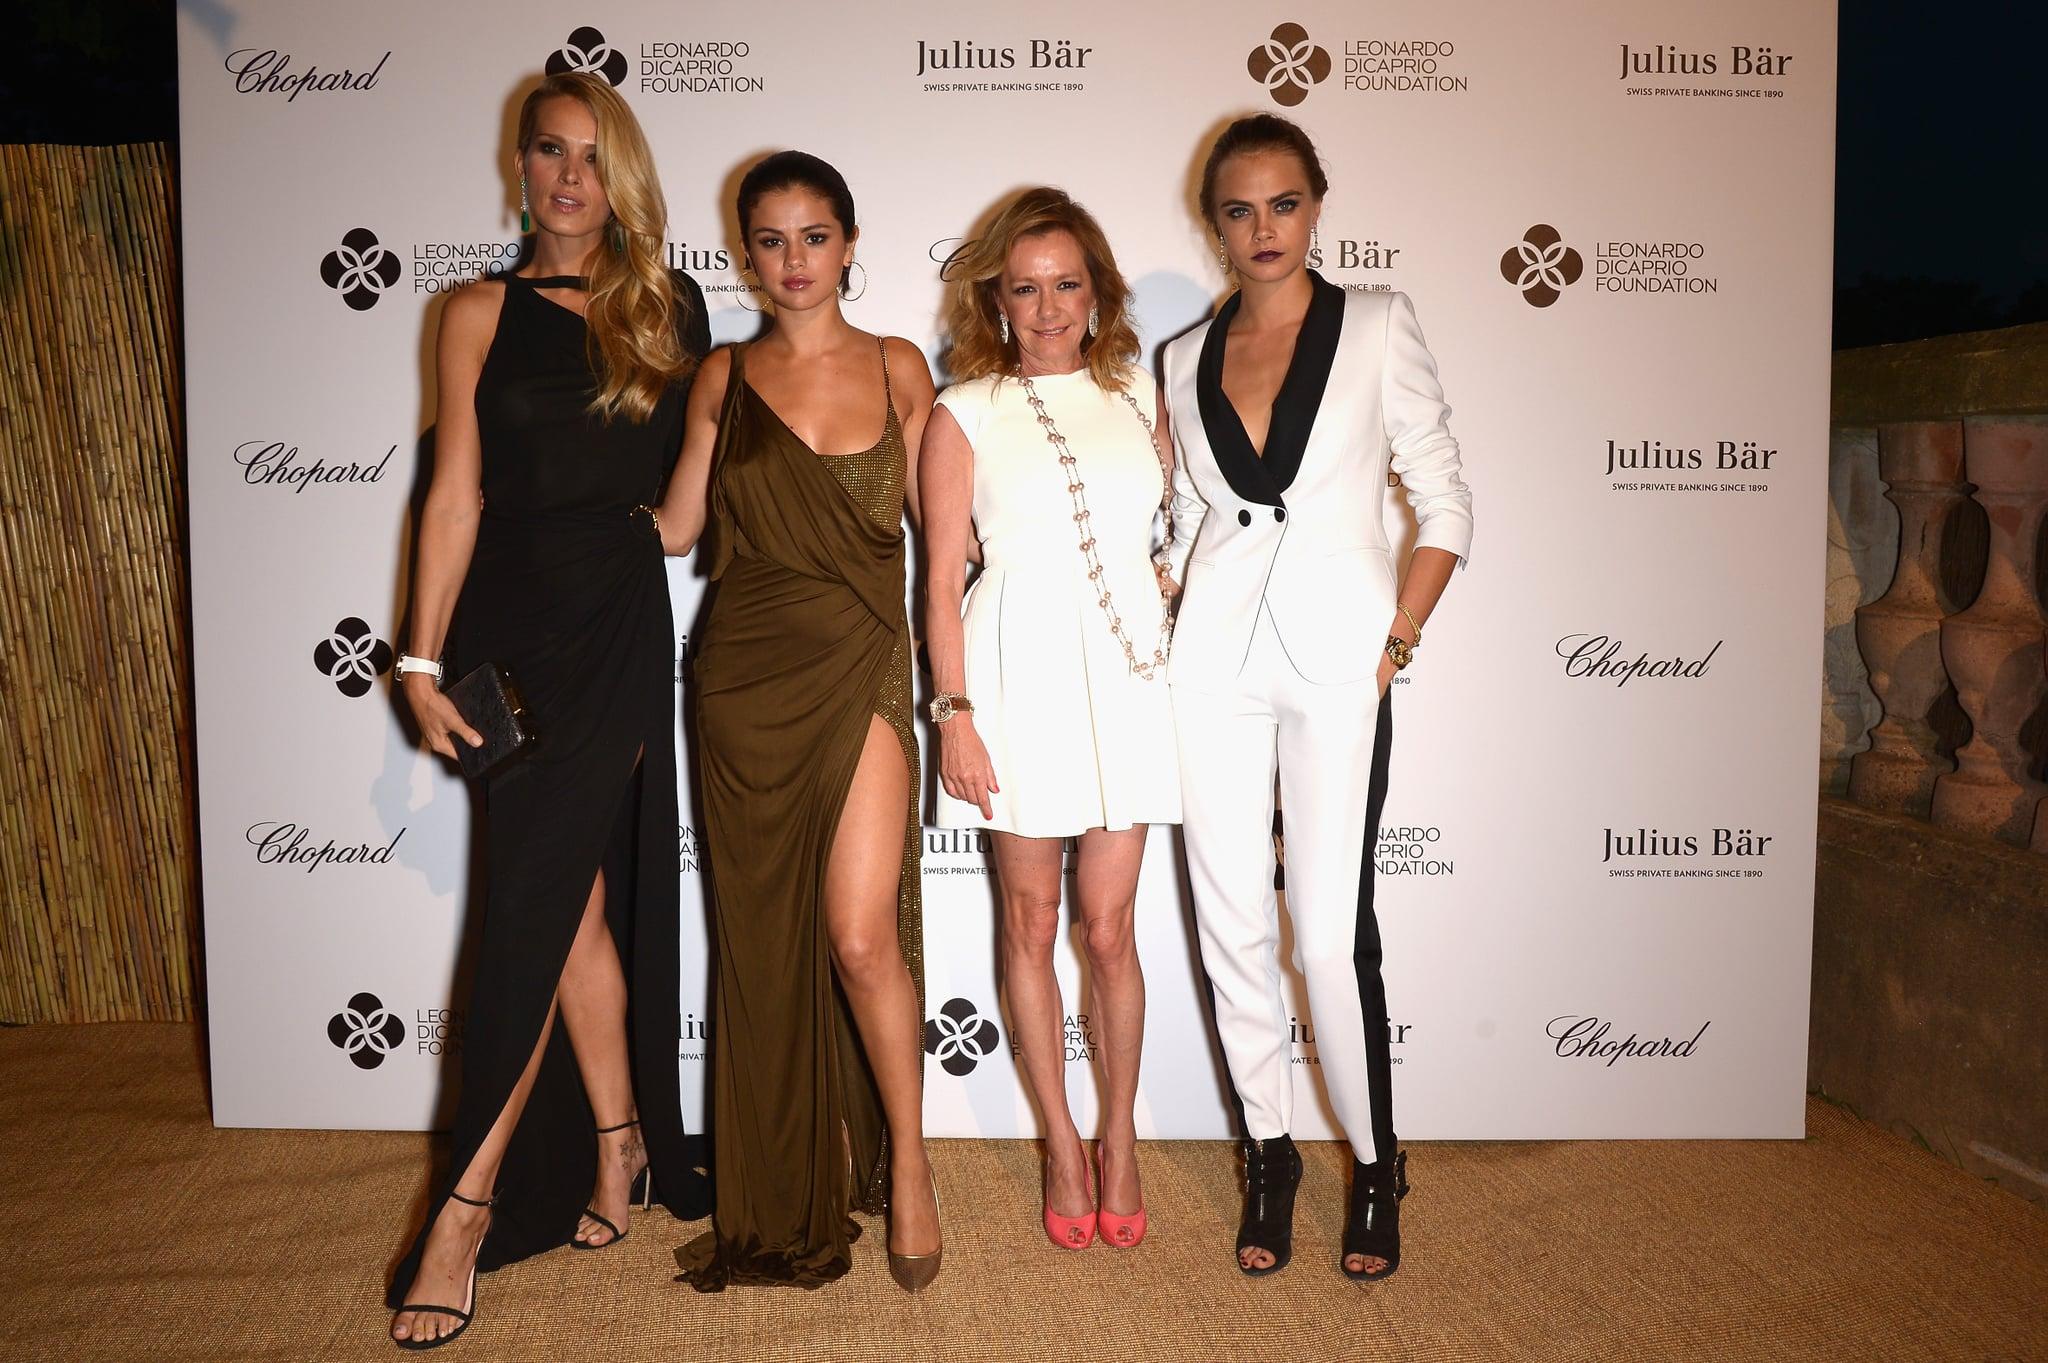 Petra Nemcova, Selena Gomez, Caroline Schuefele, and Cara Delevingne posed together.